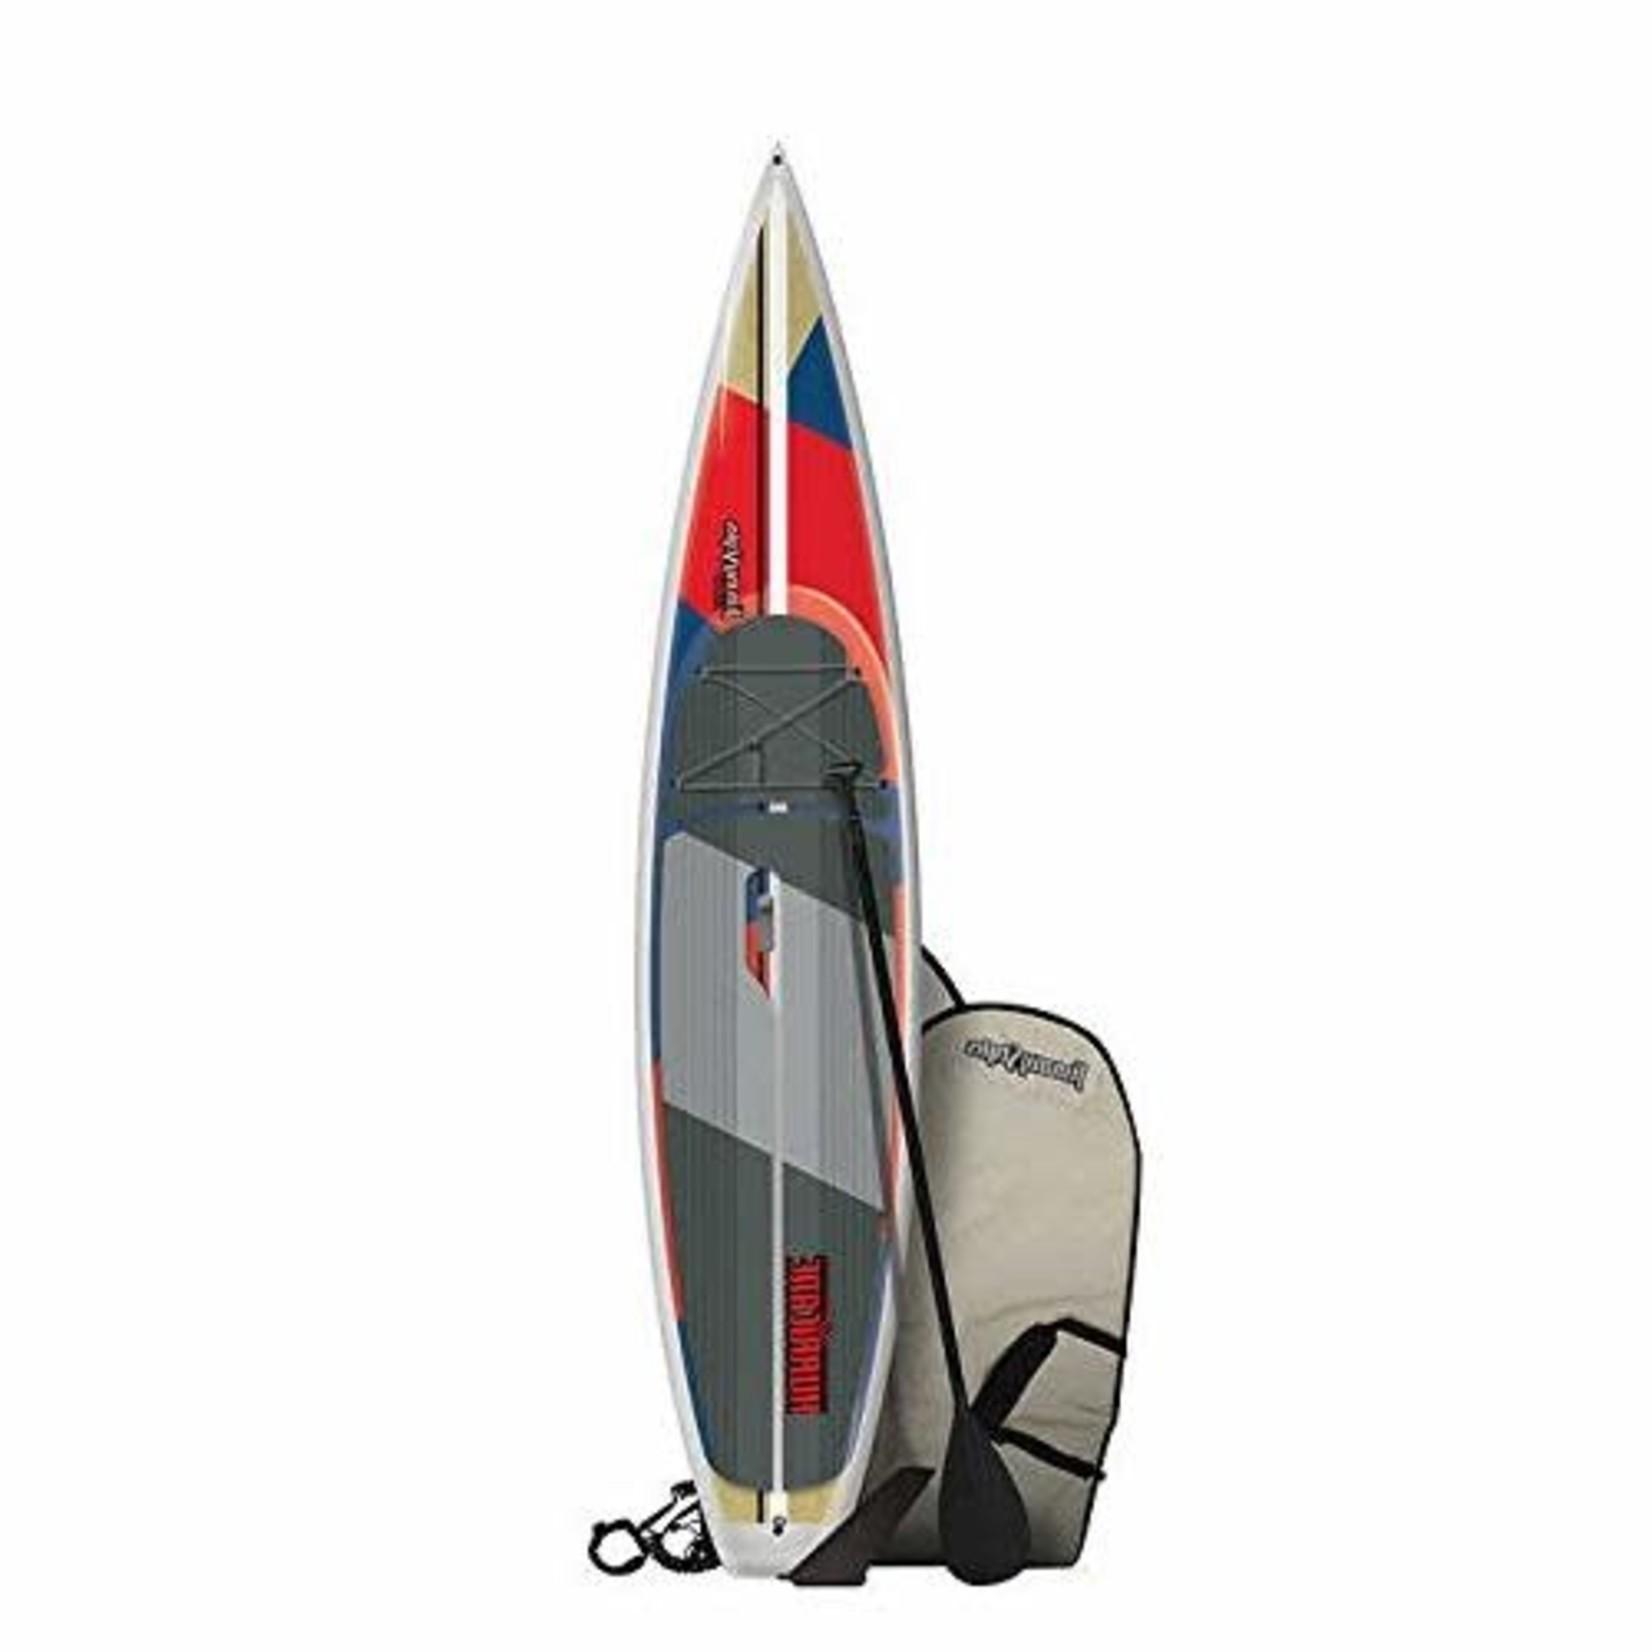 "Jimmy Styks Stand up Paddleboard Hurricane 12'6"""